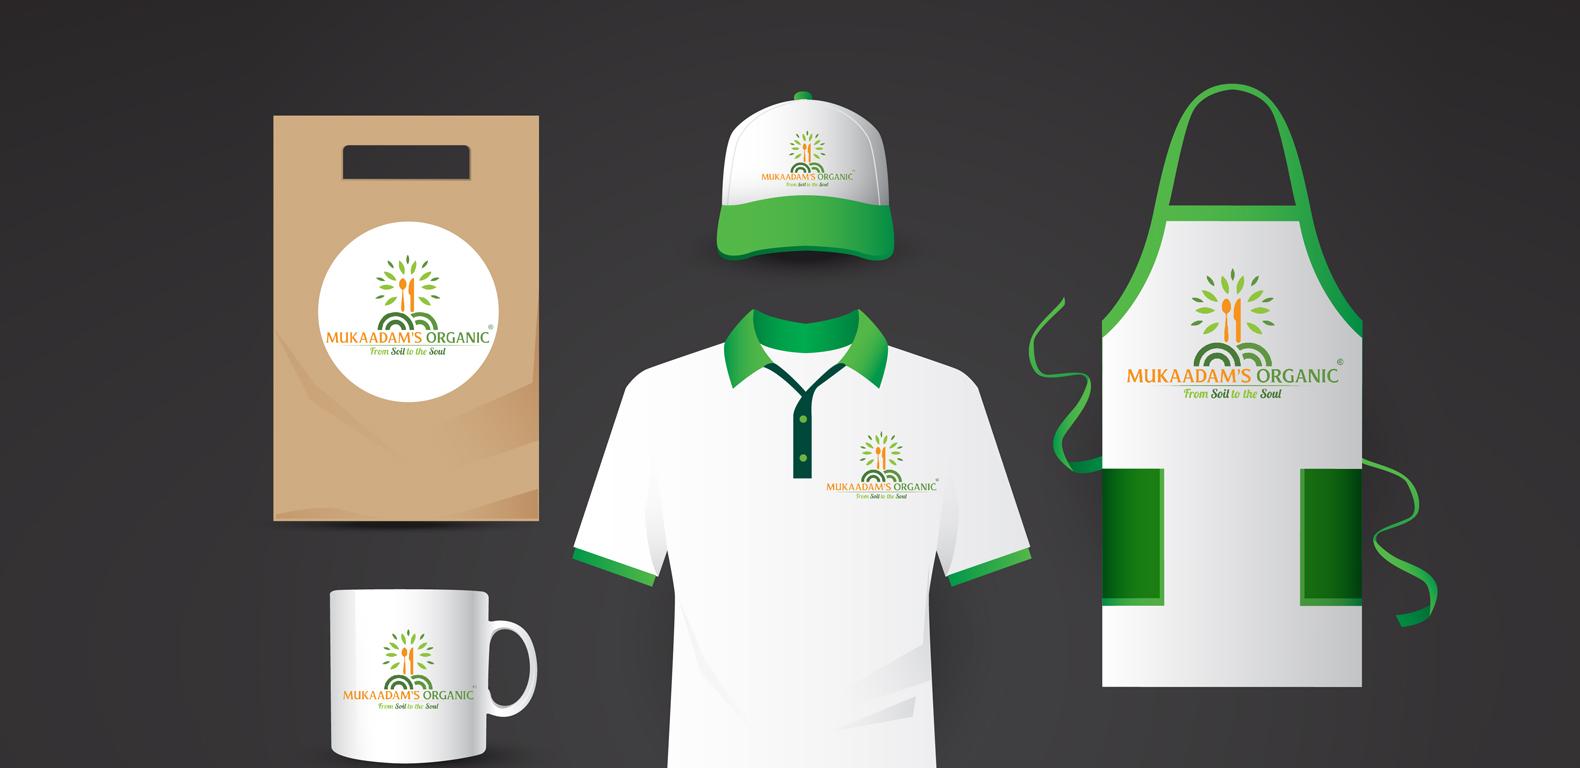 logo-design-mukaadams-organic-branded-merchandise-2